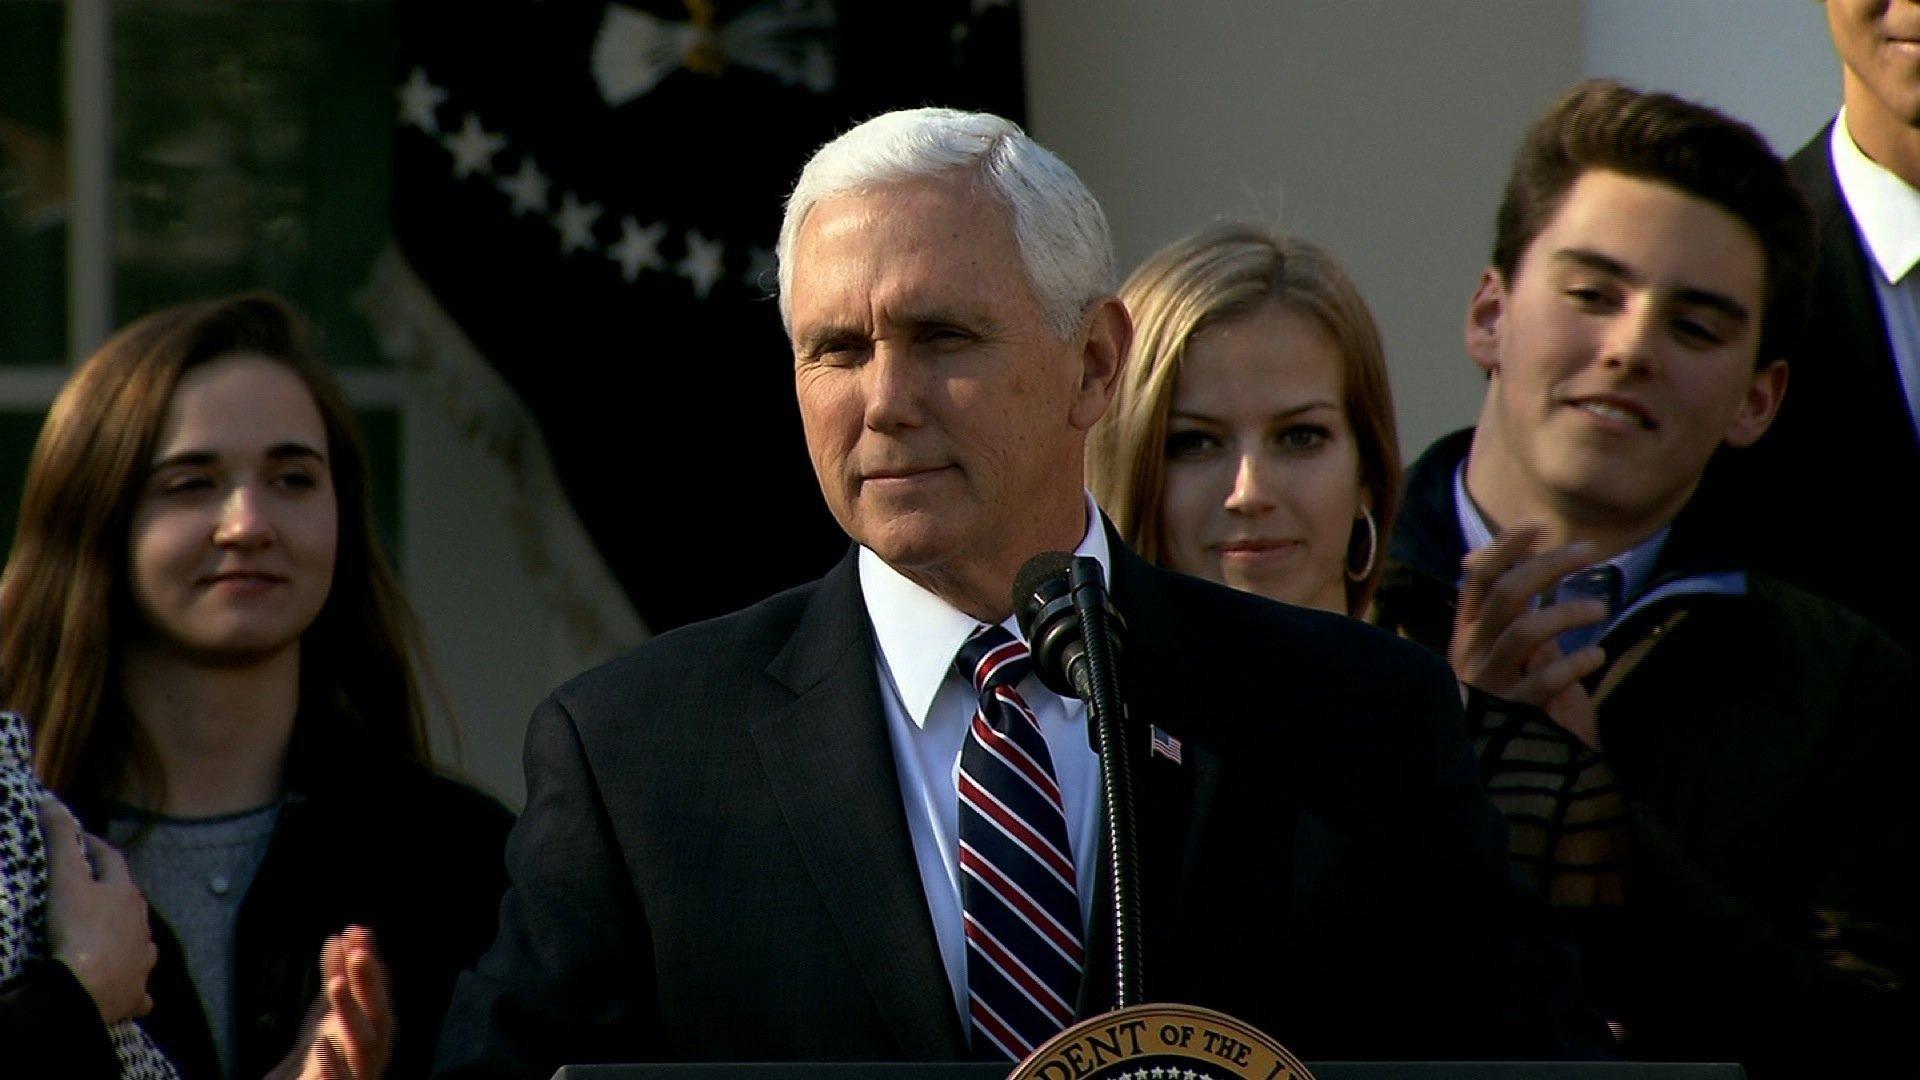 Vice President Mike Pence. CNN photo